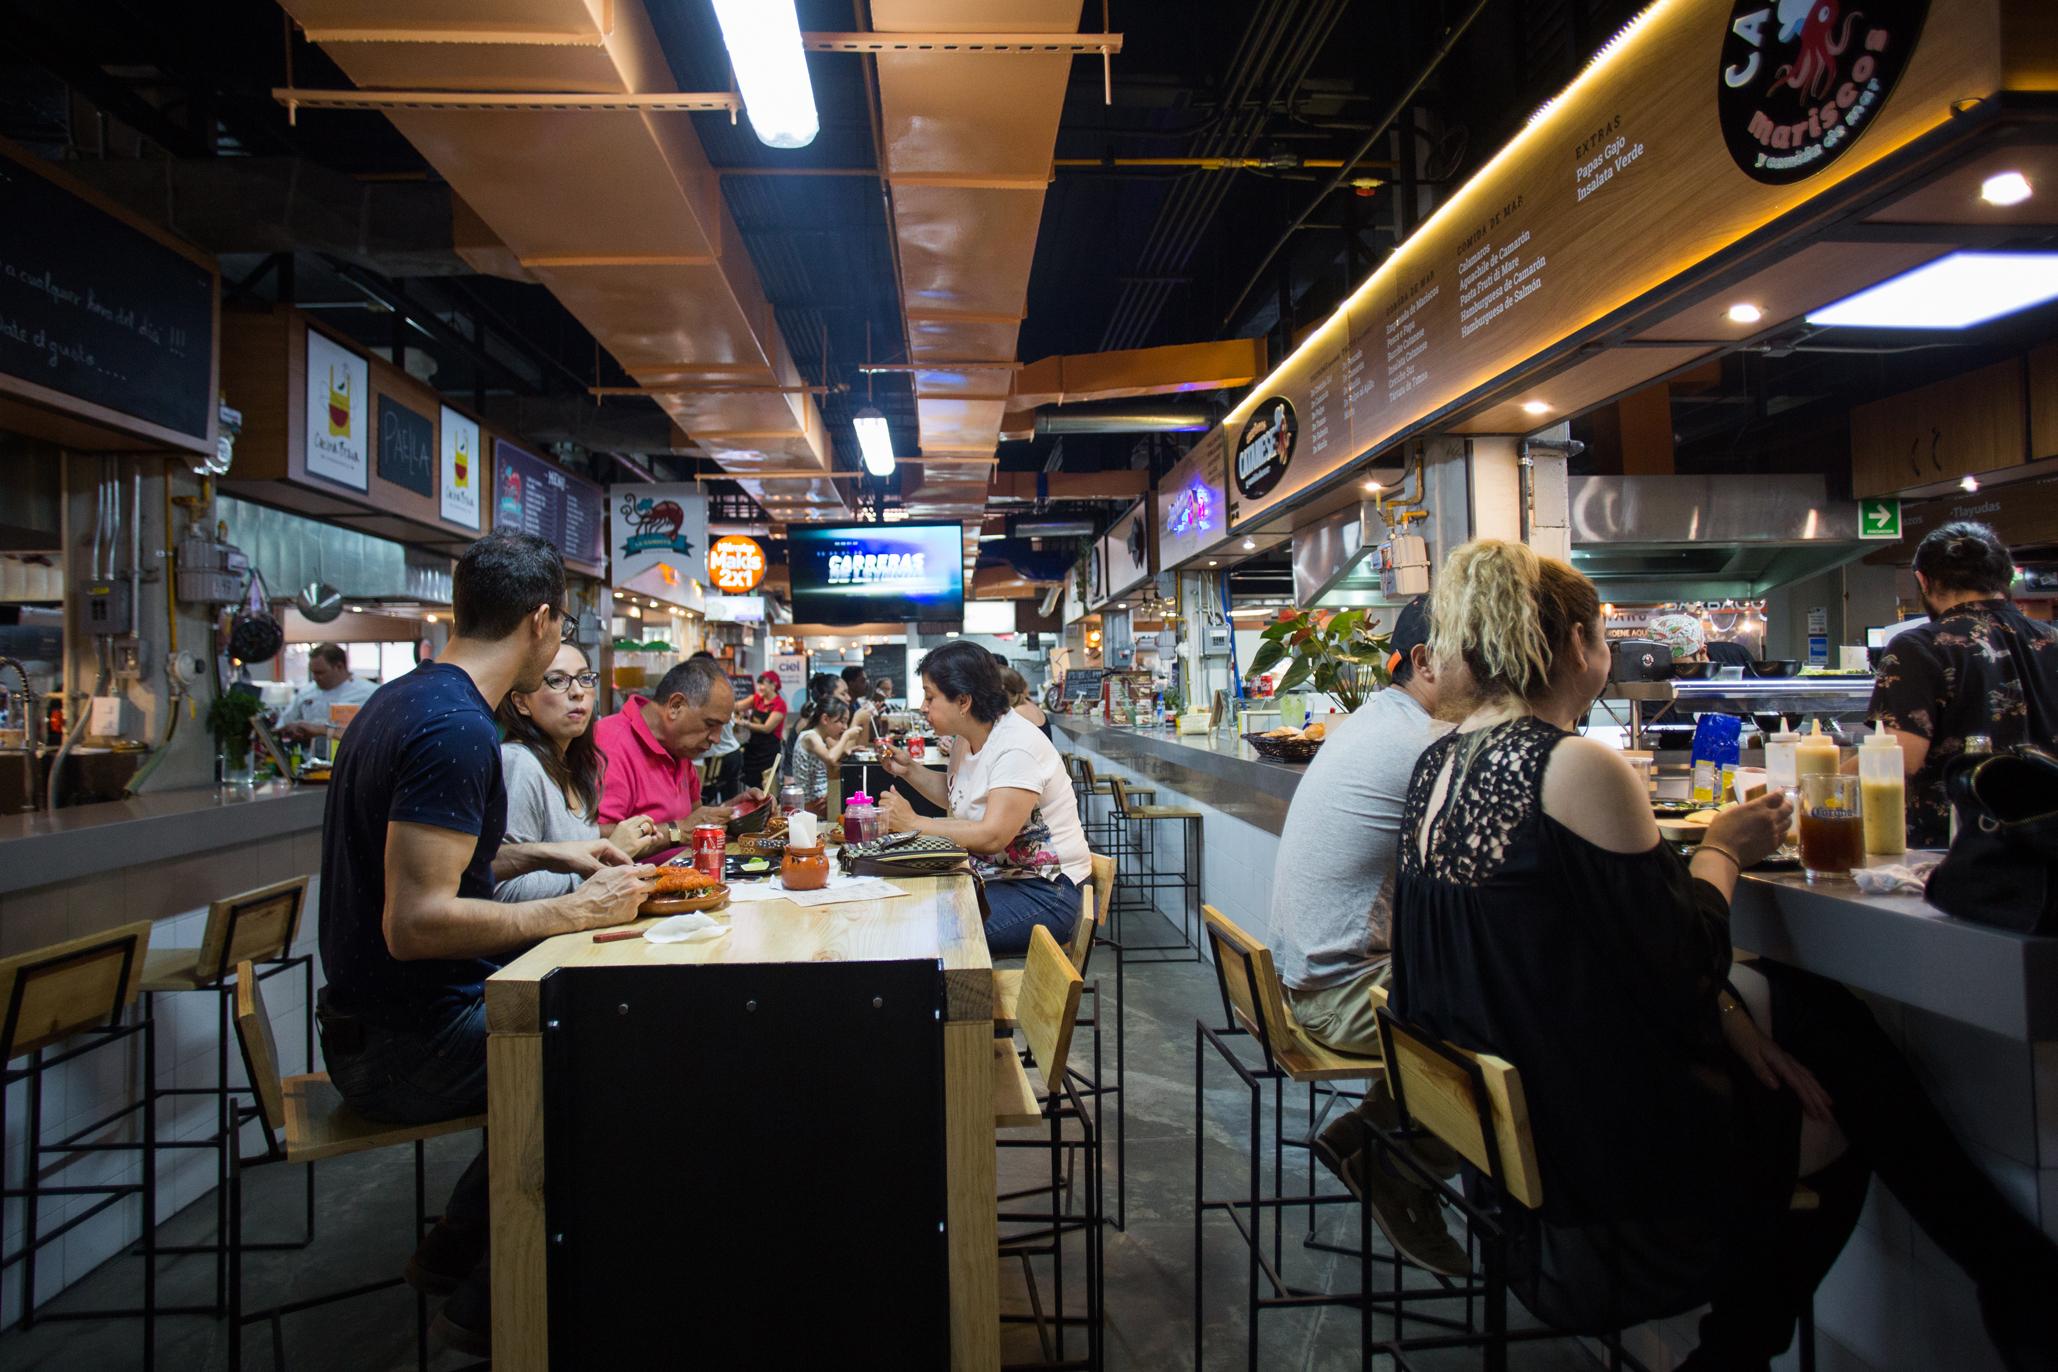 Mercado San Genaro